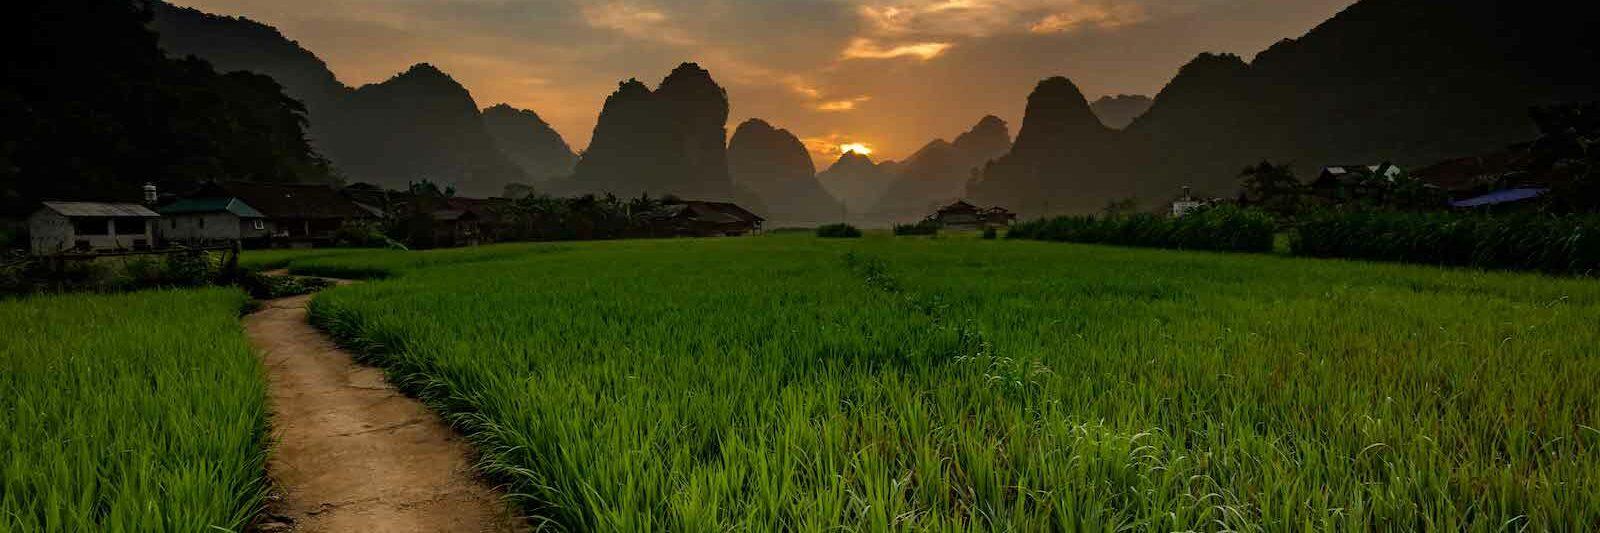 Ba Be Vietnam Nature Trail Mountains Sunrise